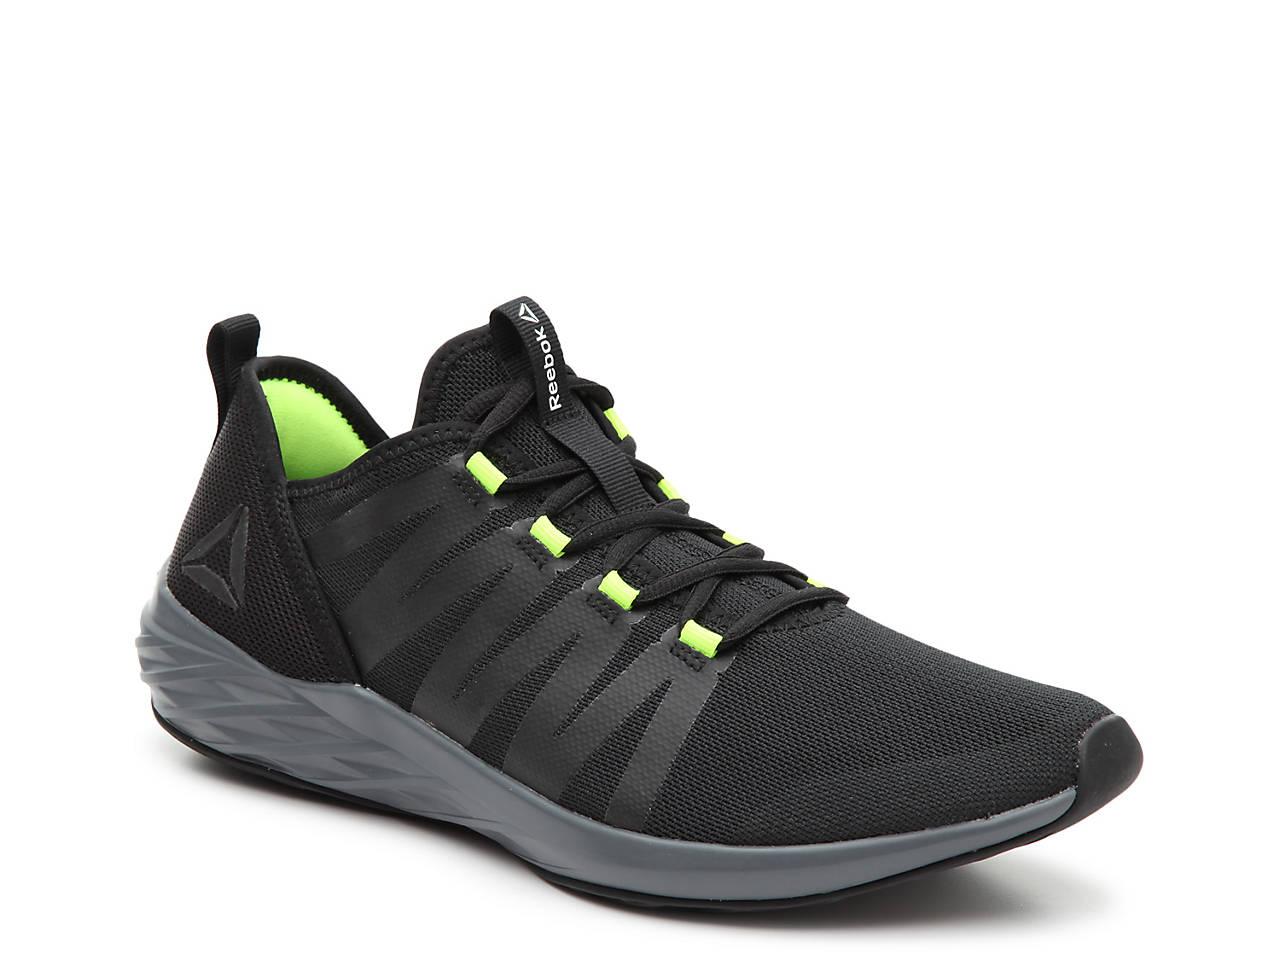 484c5f854a Reebok Astroride Future Running Shoe - Men s Men s Shoes